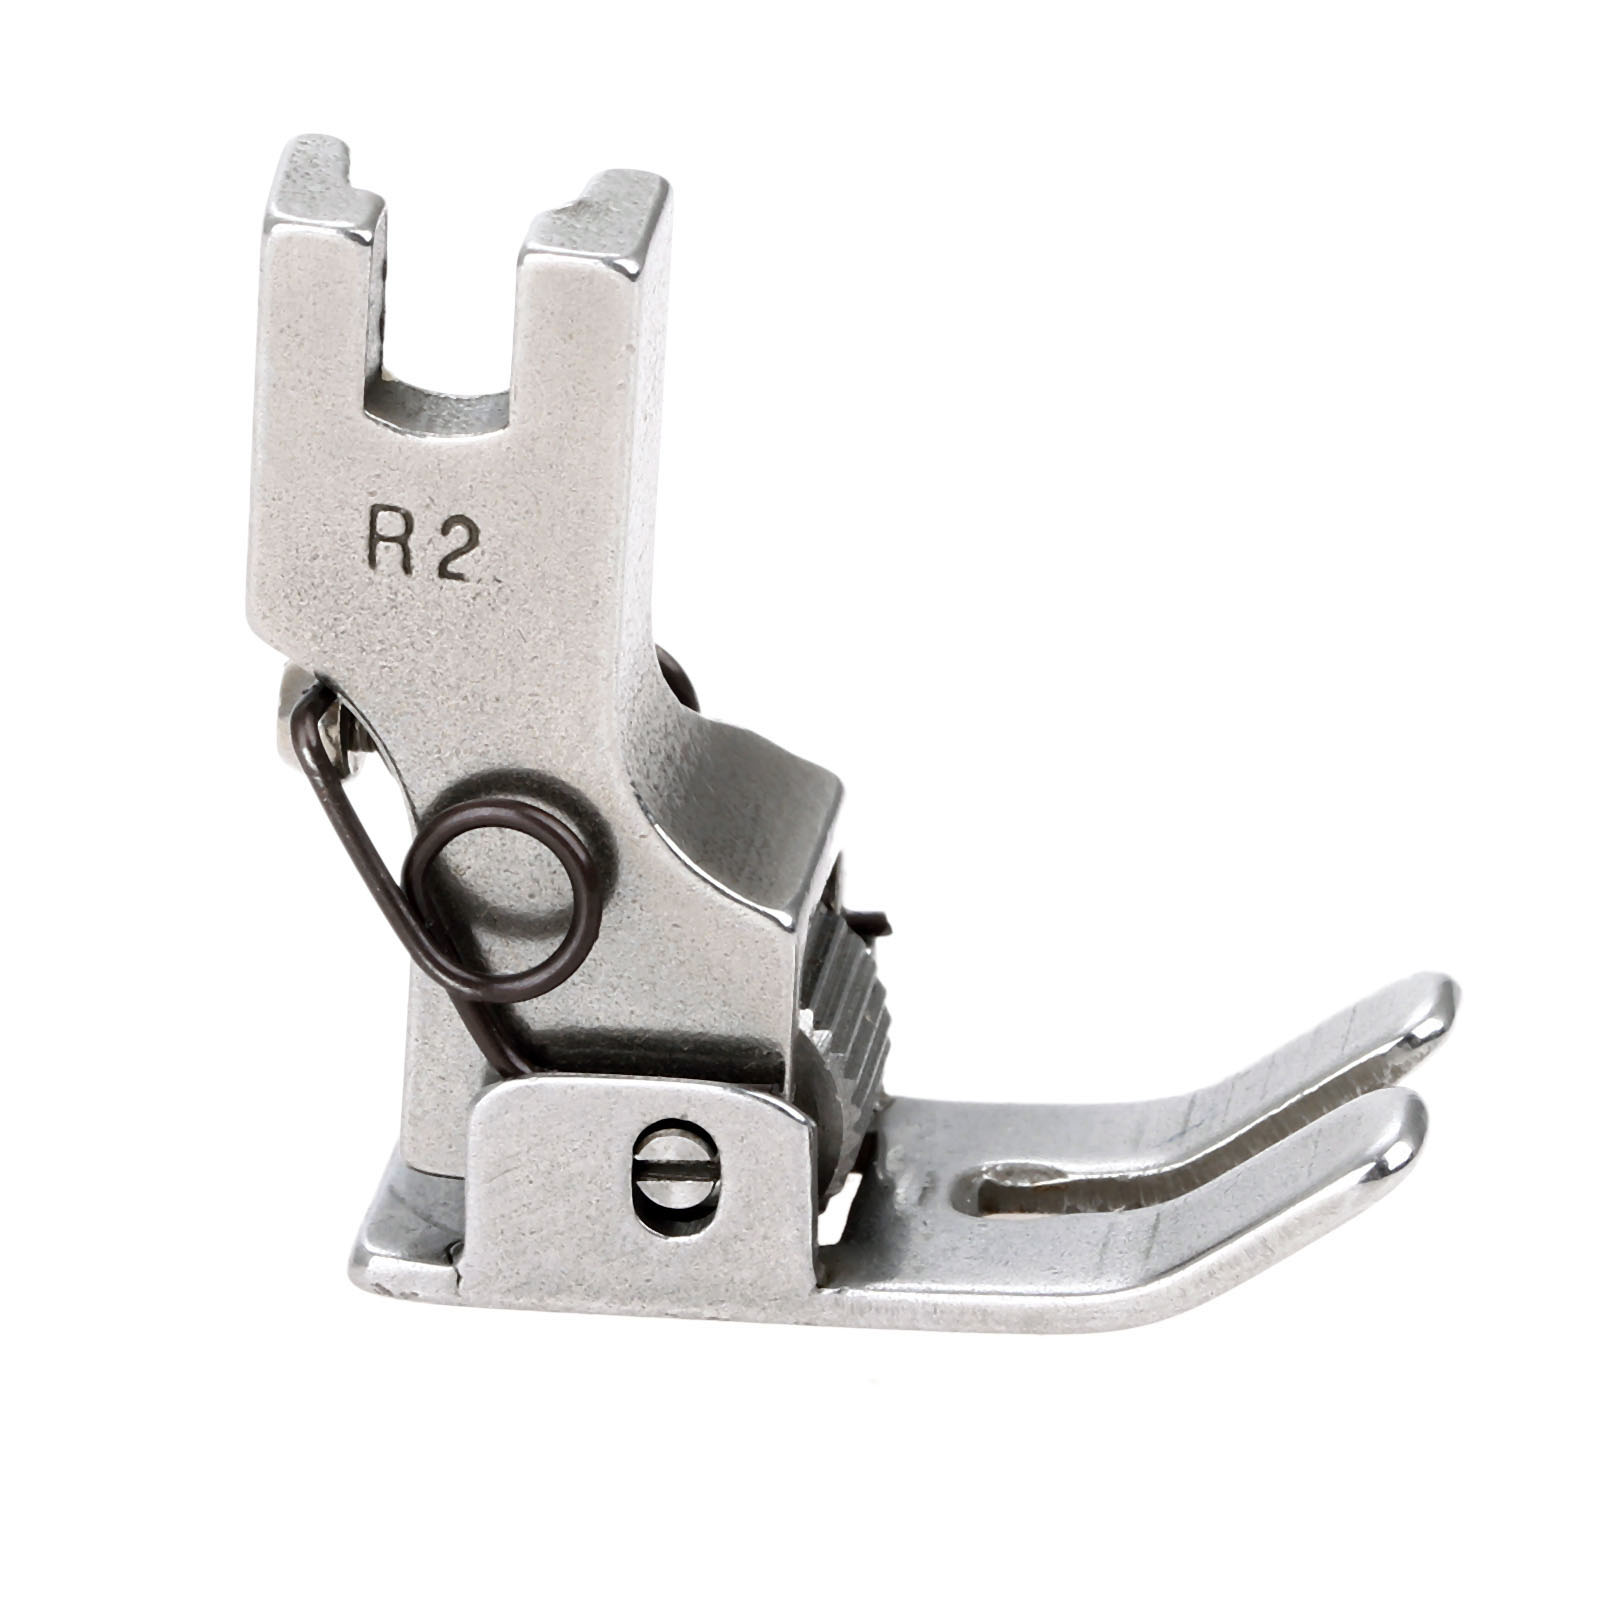 1Pc Industrial Sewing Machine Parts Steel Flatcar Roller Presser Foot R2 Flat Platen Roller Wheels For Industrial Sewing Machine